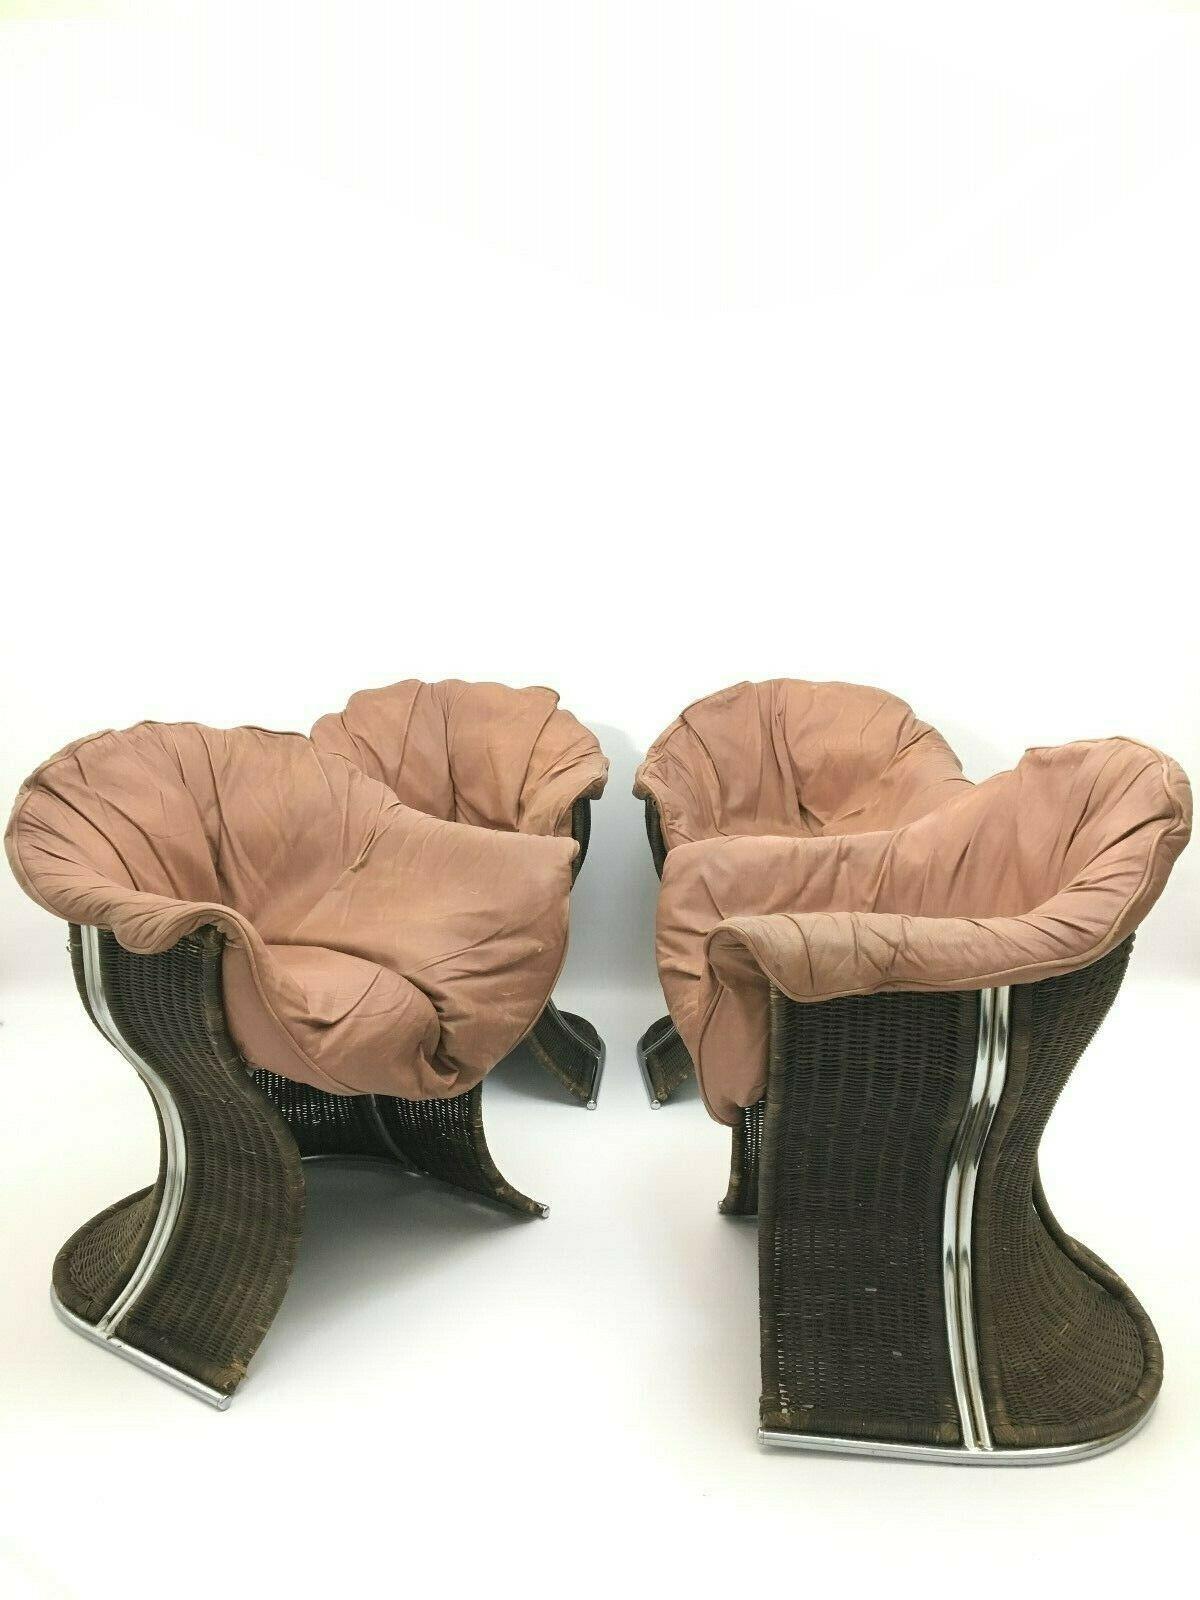 Fine Unique Vintage Retro Wicker Leather Chairs Armchair Venus By Pieff Set Of 4 Dailytribune Chair Design For Home Dailytribuneorg